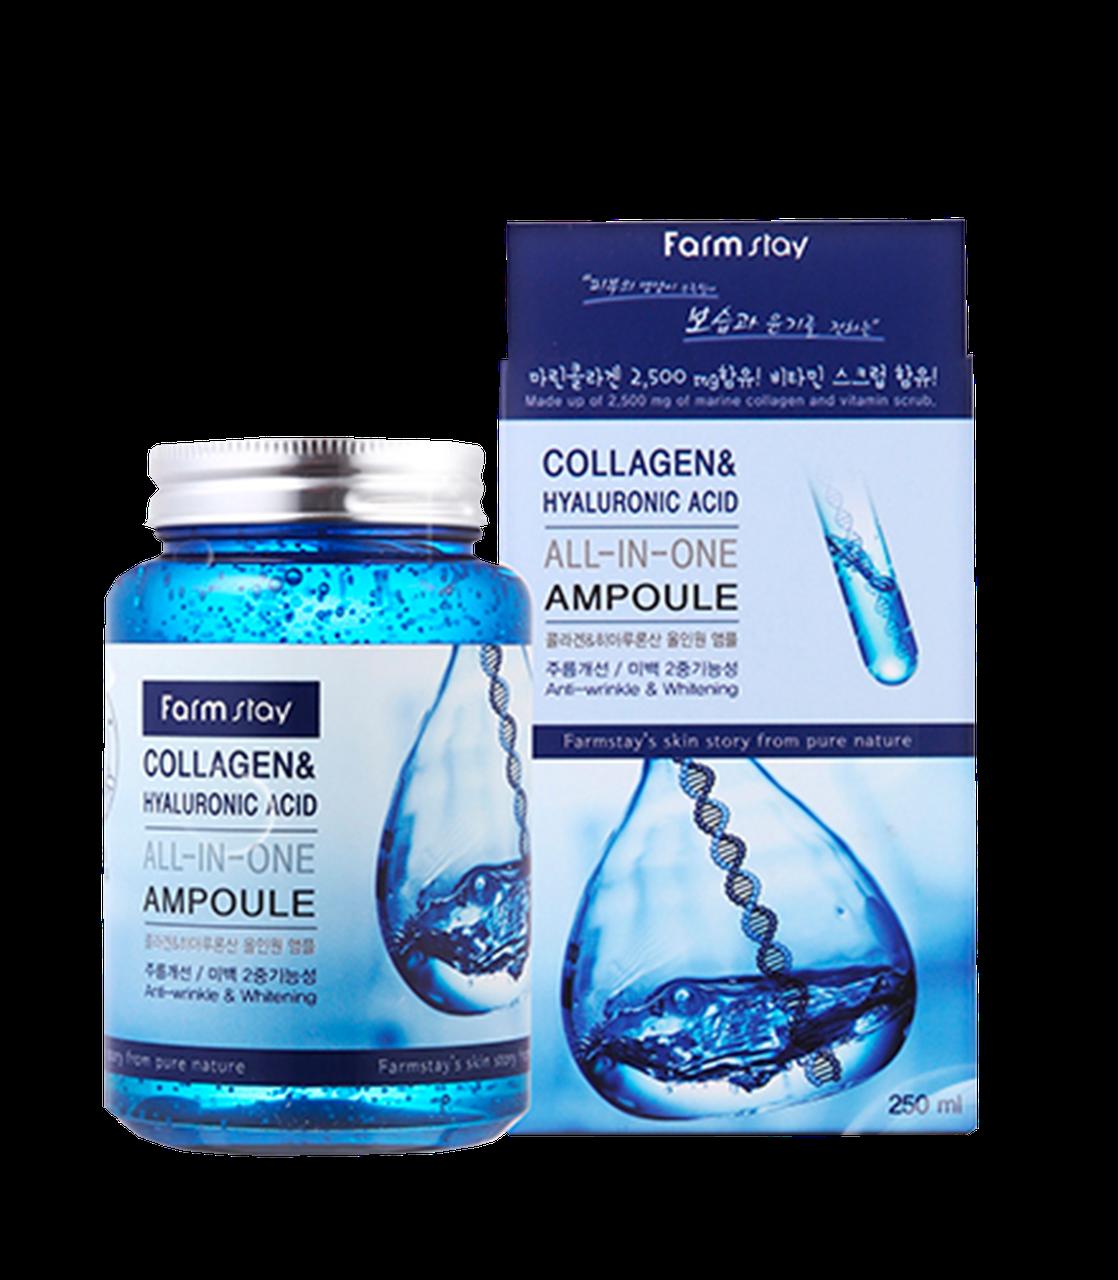 FarmStay All-in-one Collagen&Hyaluronic Acid Ampoule Натуральный жидкий экстракт 2в1 гиалурон и коллаген 250мл